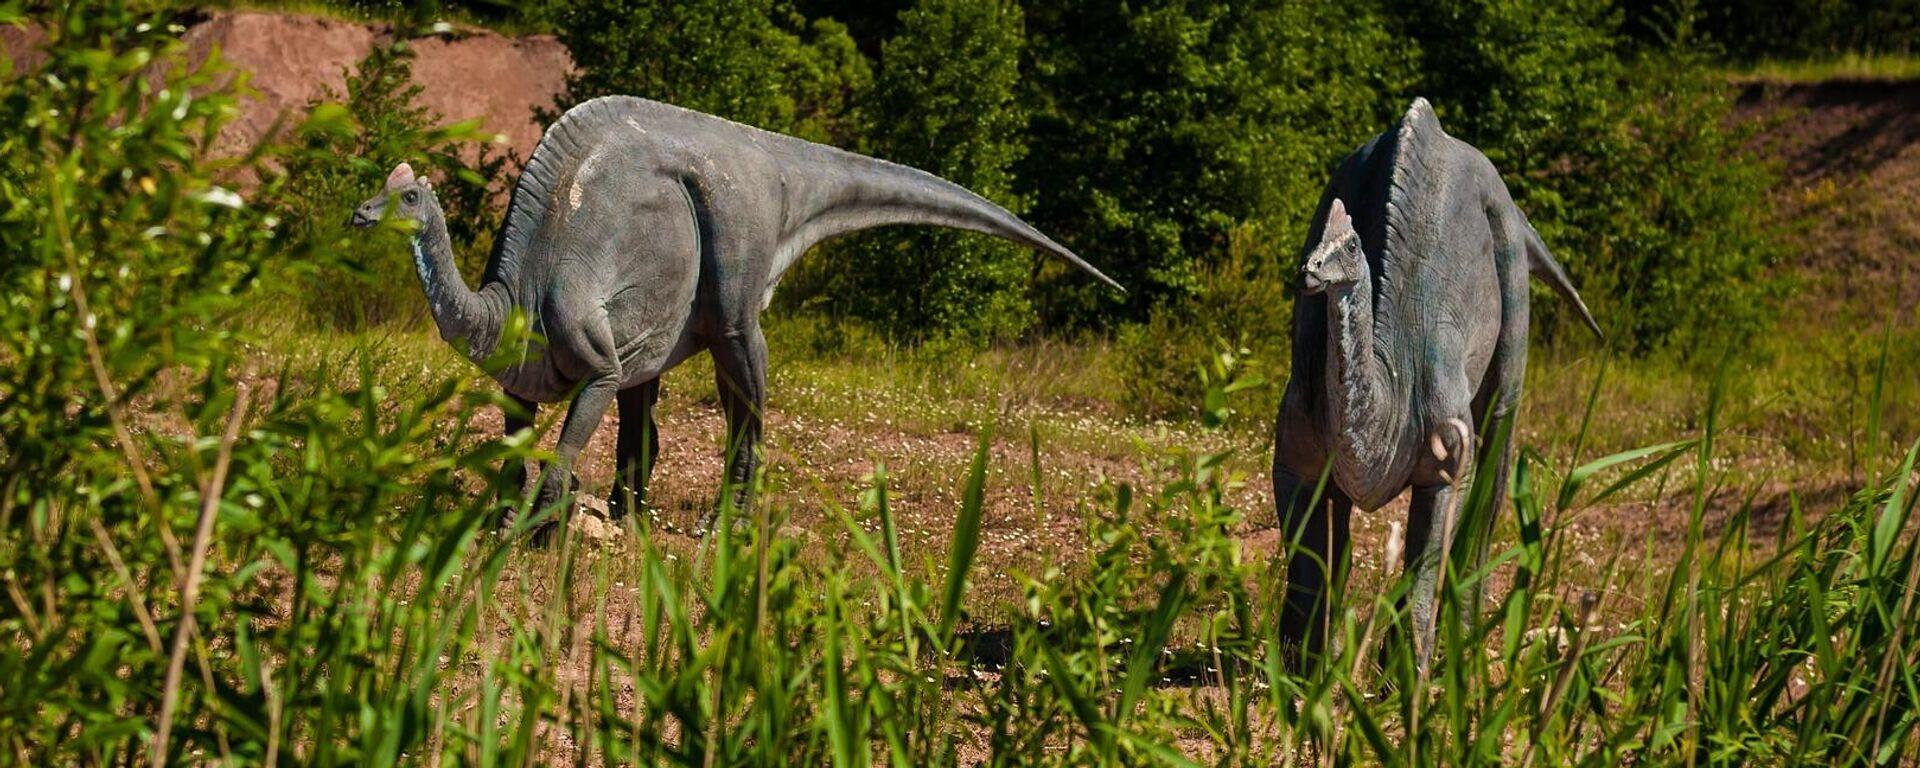 Corythosaurus (imagen referencial) - Sputnik Mundo, 1920, 08.07.2021